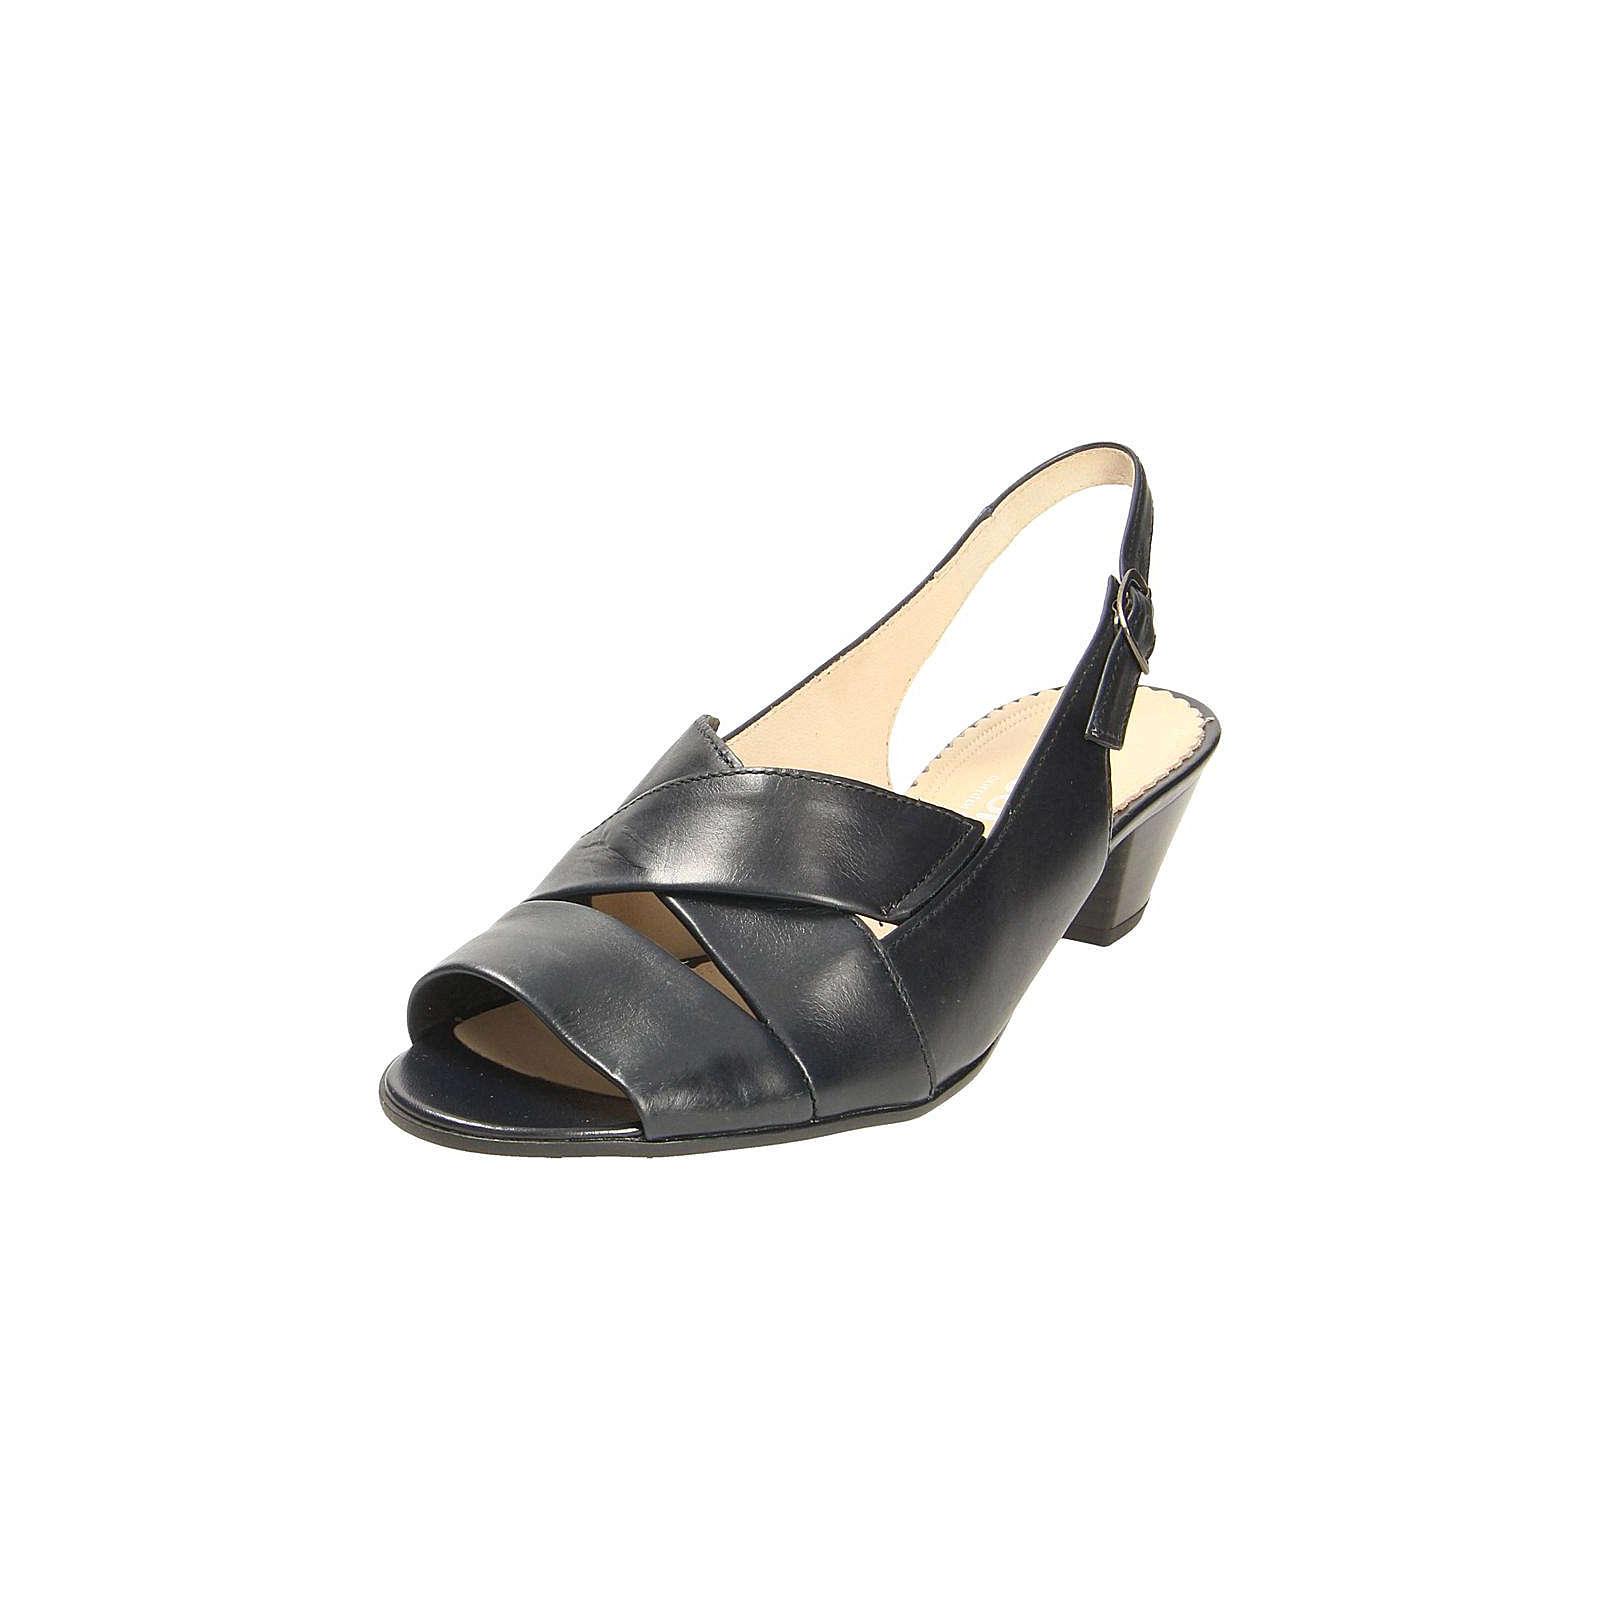 Gabor Klassische Sandaletten schwarz Damen Gr. 37,5